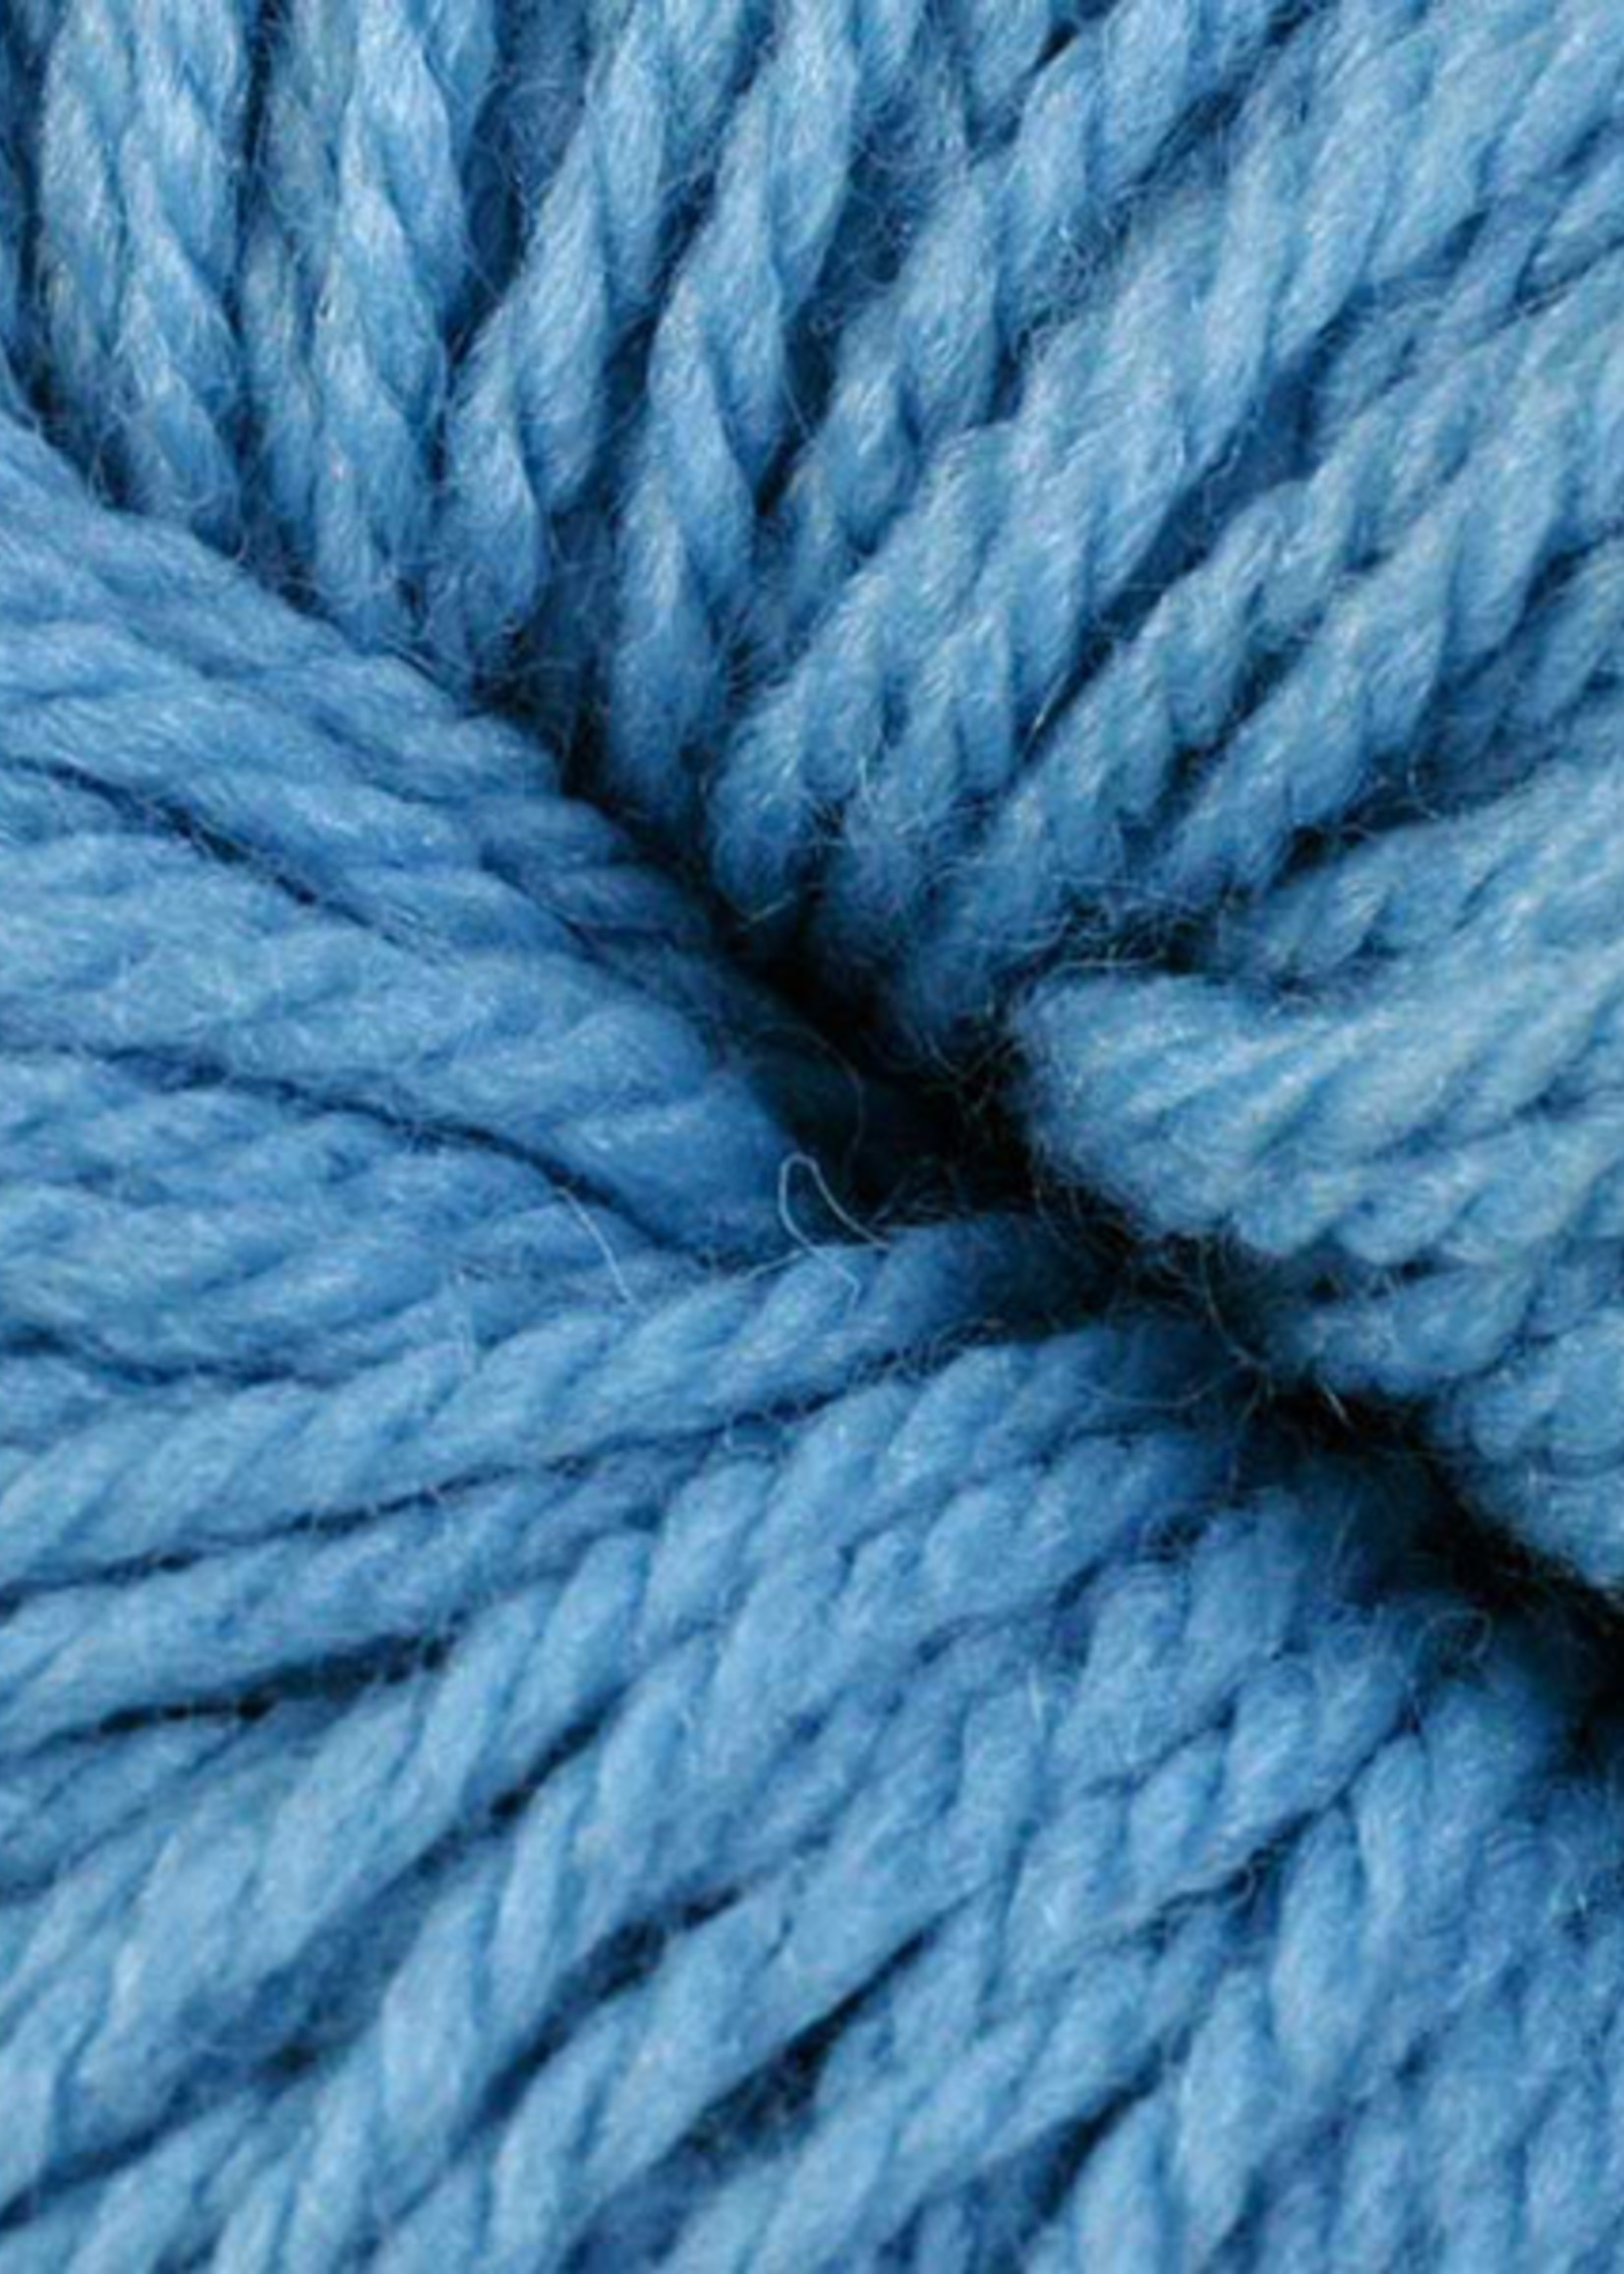 Berroco Berroco Vintage DK Yarn #2132 Sky Blue